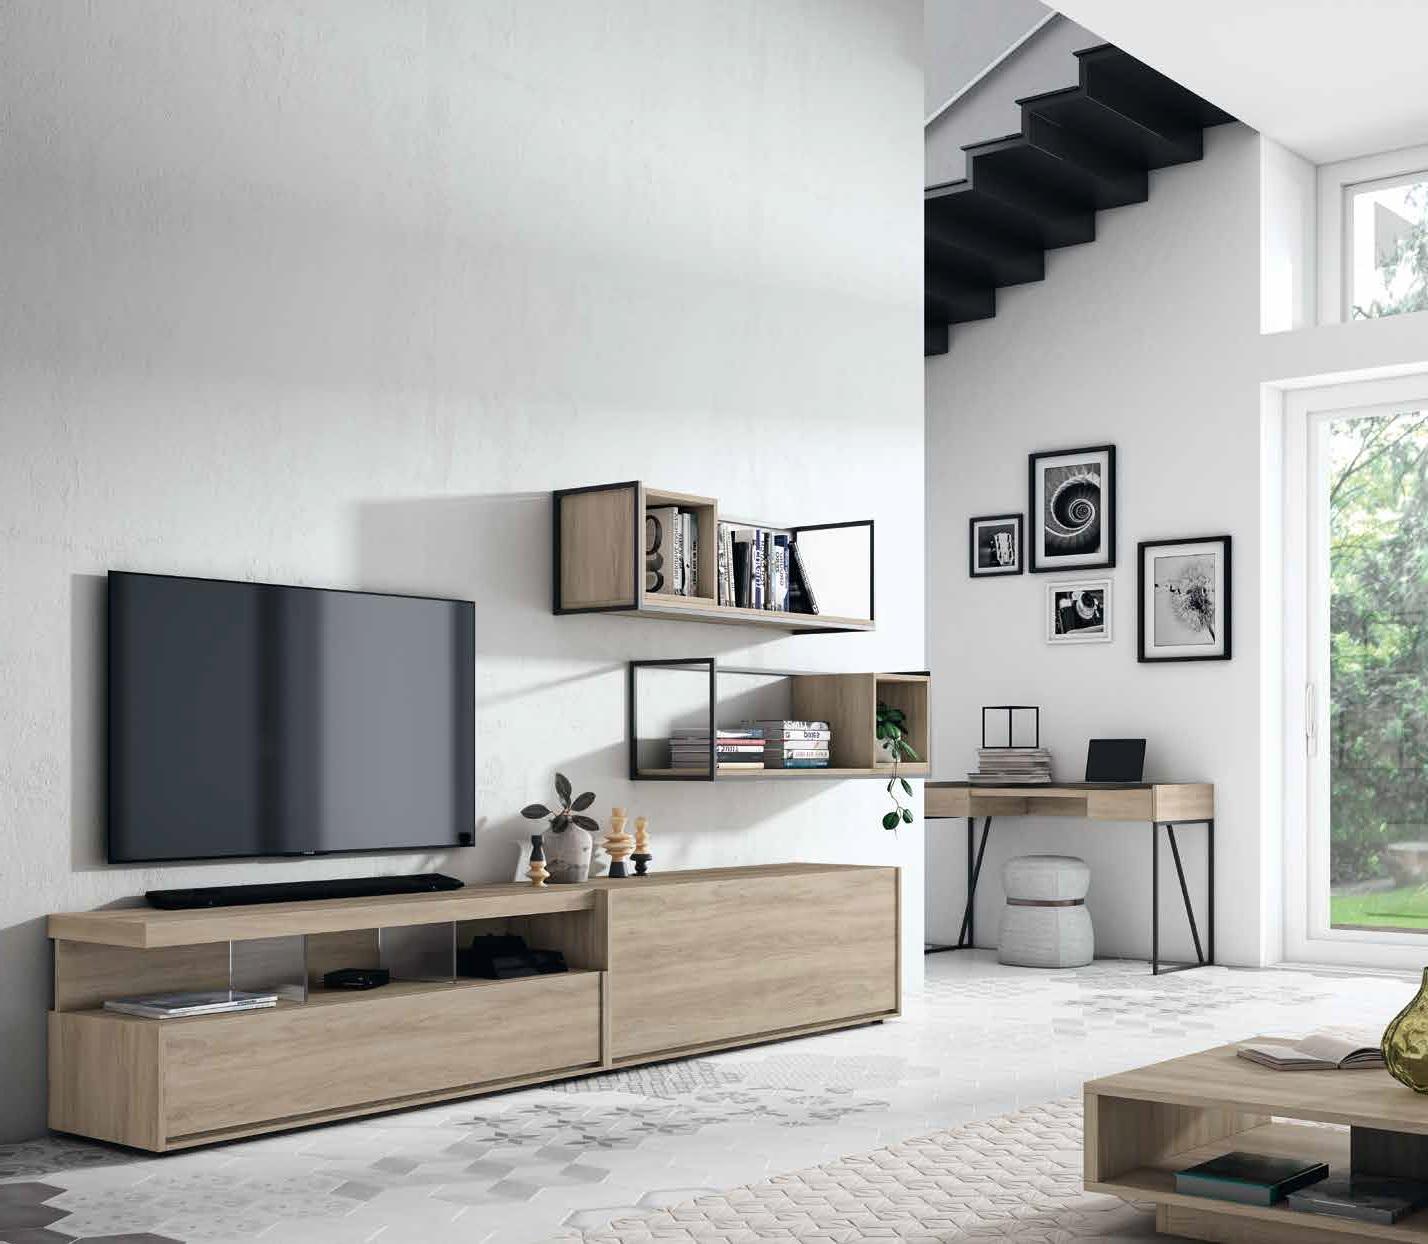 salon-moderno-Nativ-2019-muebles-paco-caballero-0920-5c8ceaac3e7f0